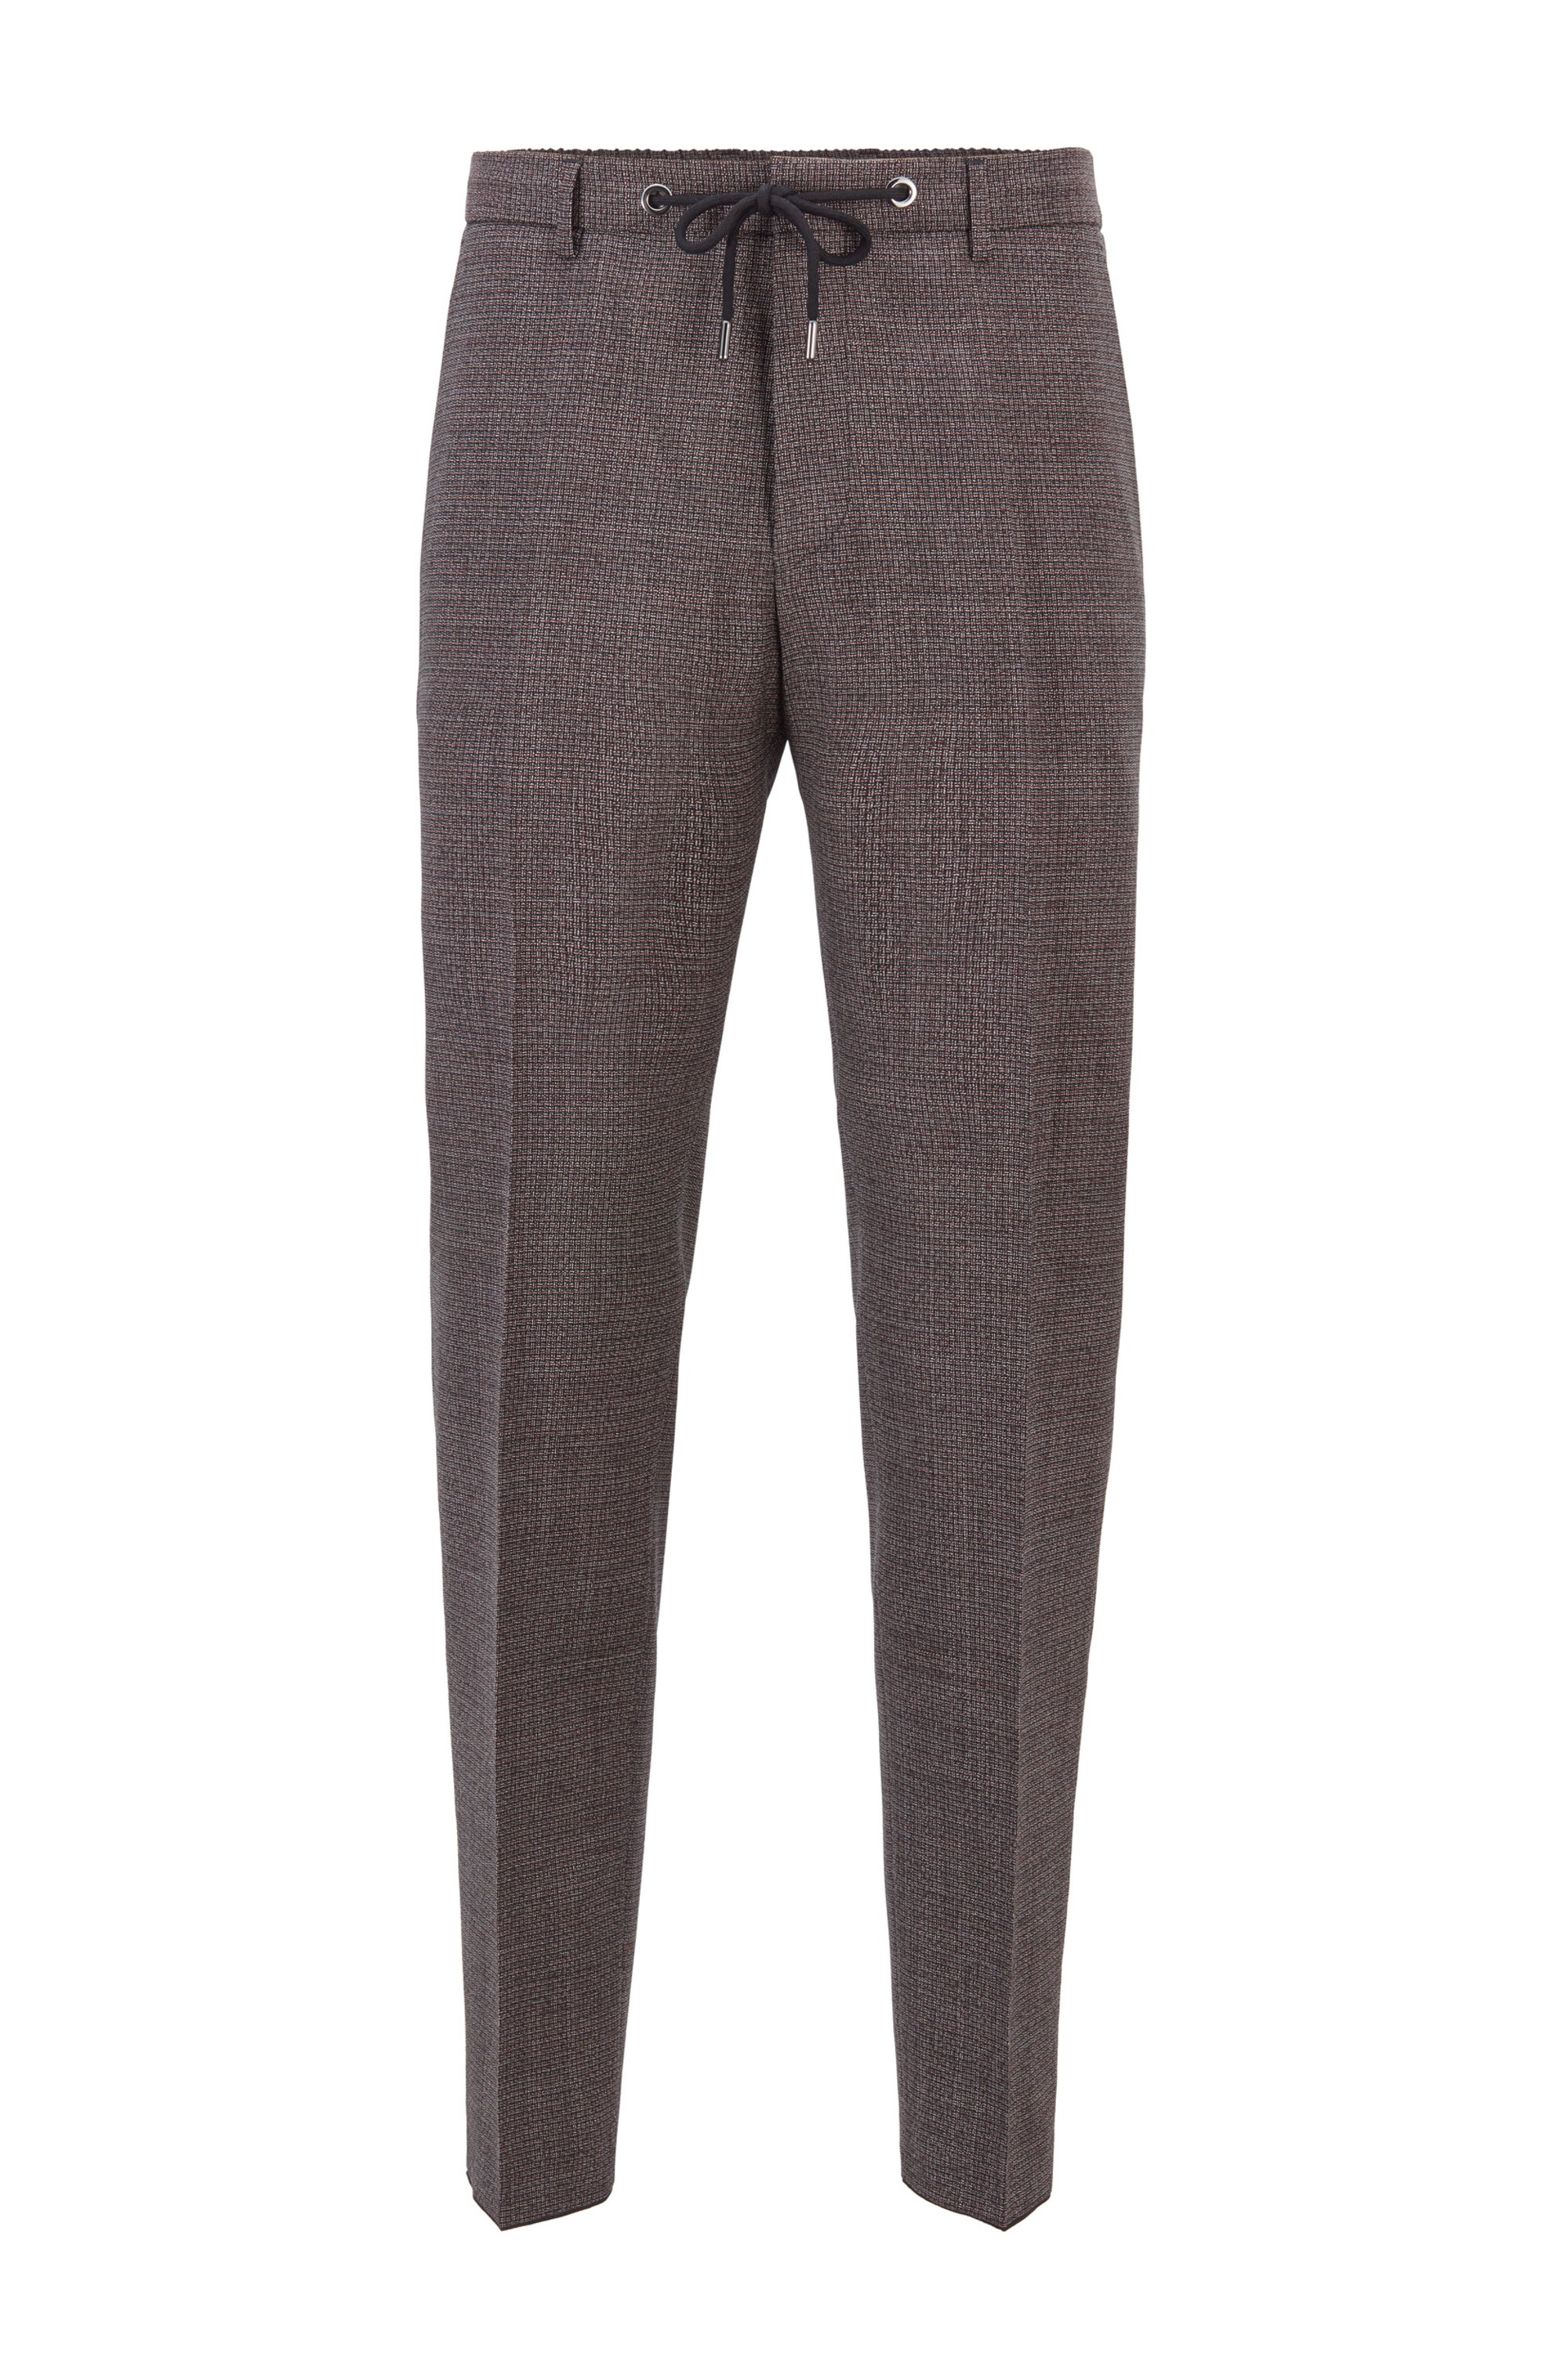 Pantaloni slim fit in lana vergine con micromotivo, Marrone a motivi